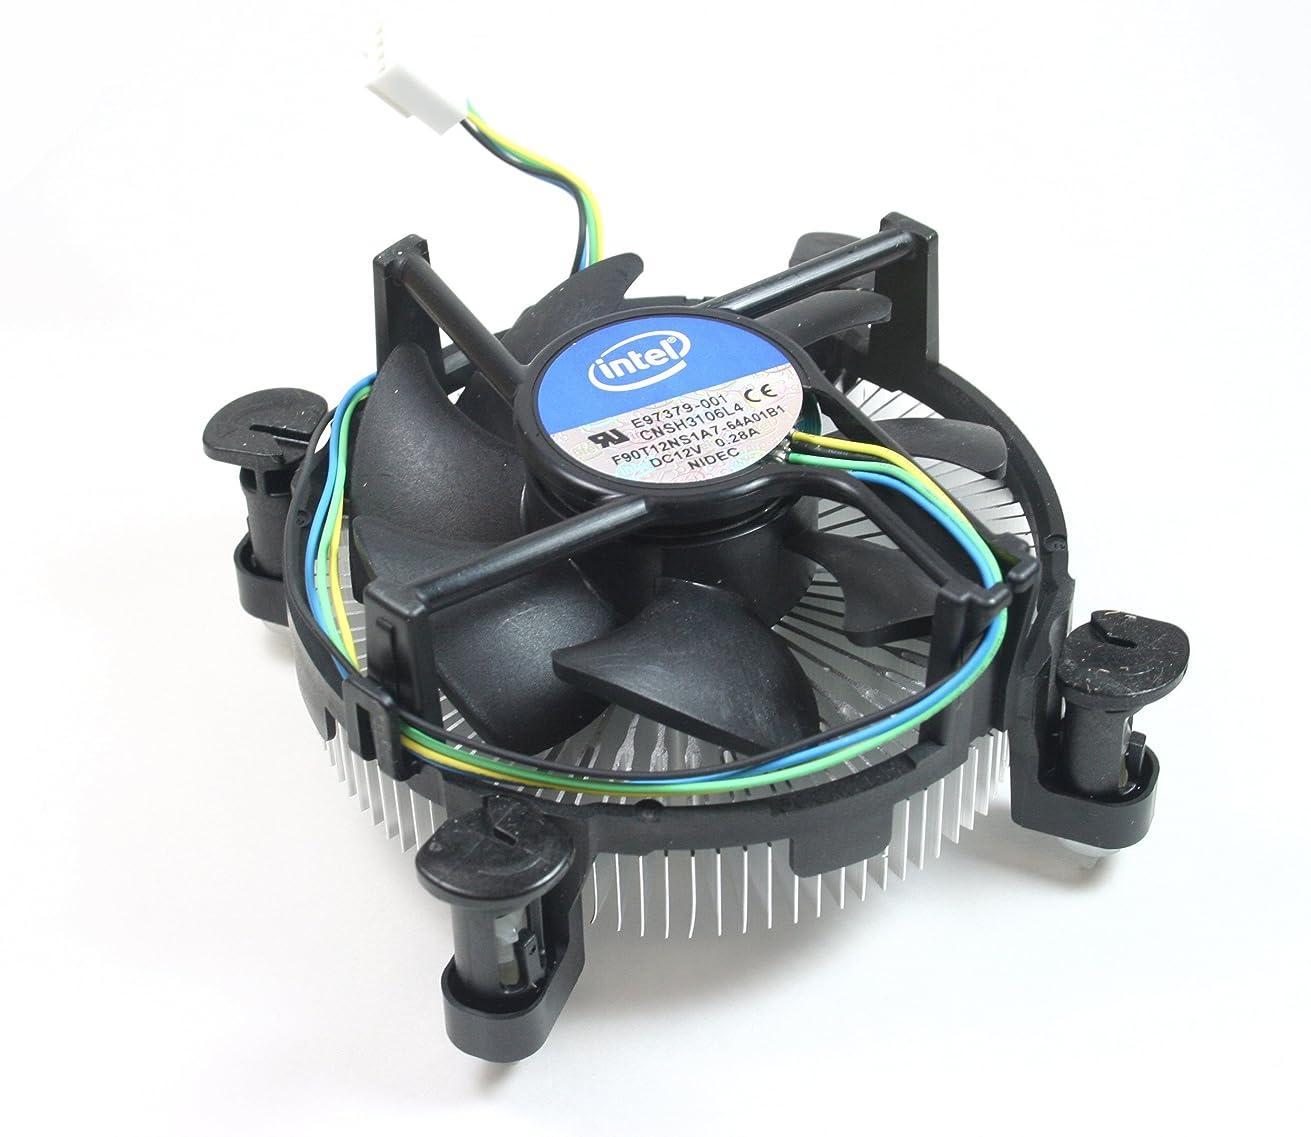 INTEL CPU Cooler with Heatsink E97379-001 3.5in C LGA Heatsink 1155-1156